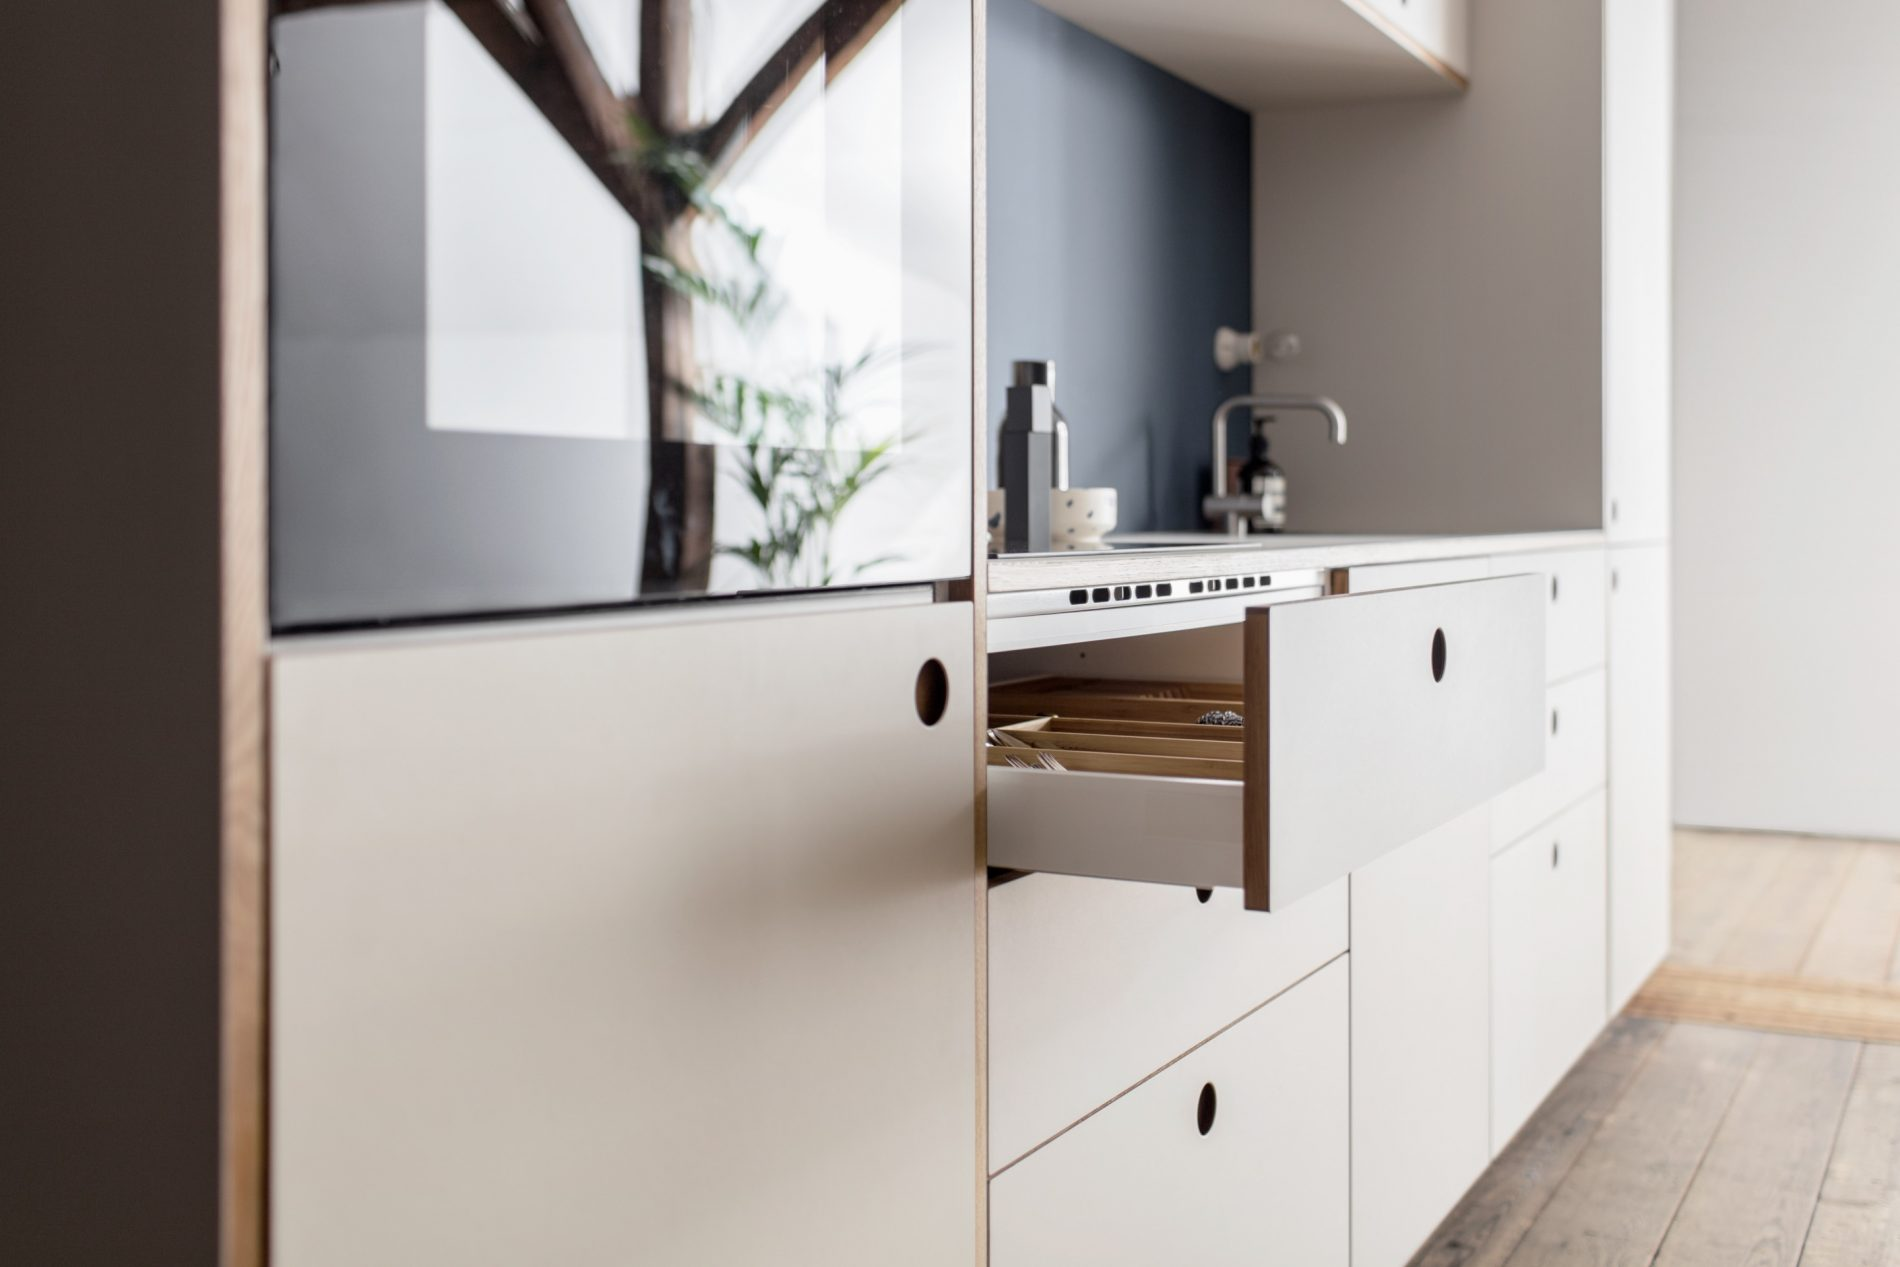 IKEA KITCHEN HACK REFORM Italianbark Interiordesignblog (8)